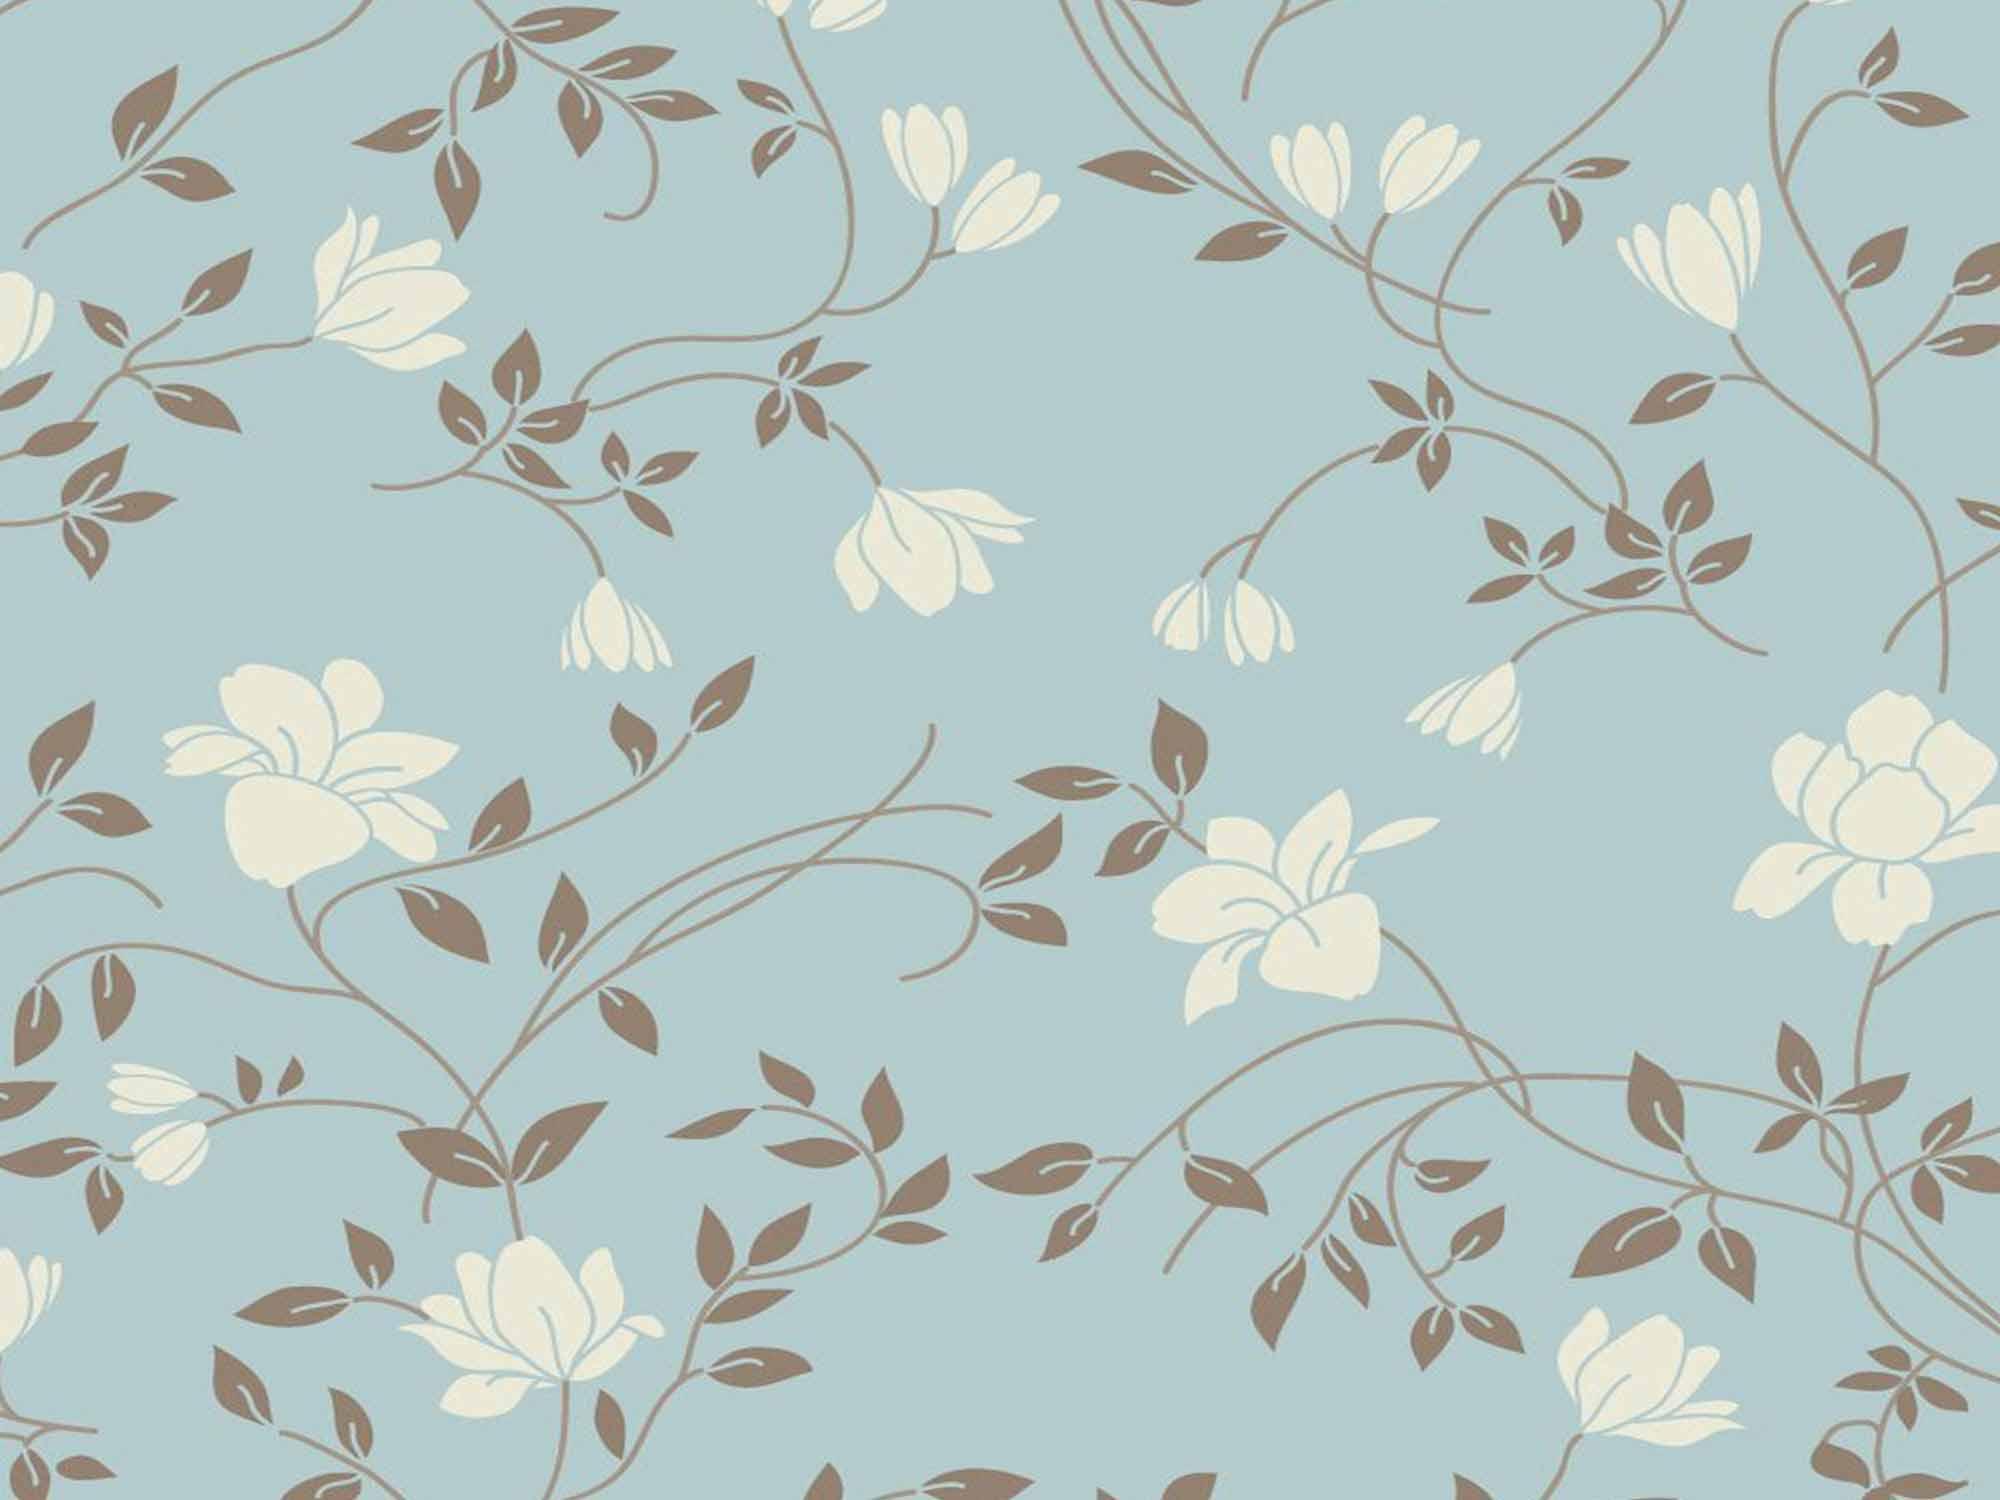 Papel de Parede Floral 0003 - Adesivos de Parede  - Paredes Decoradas